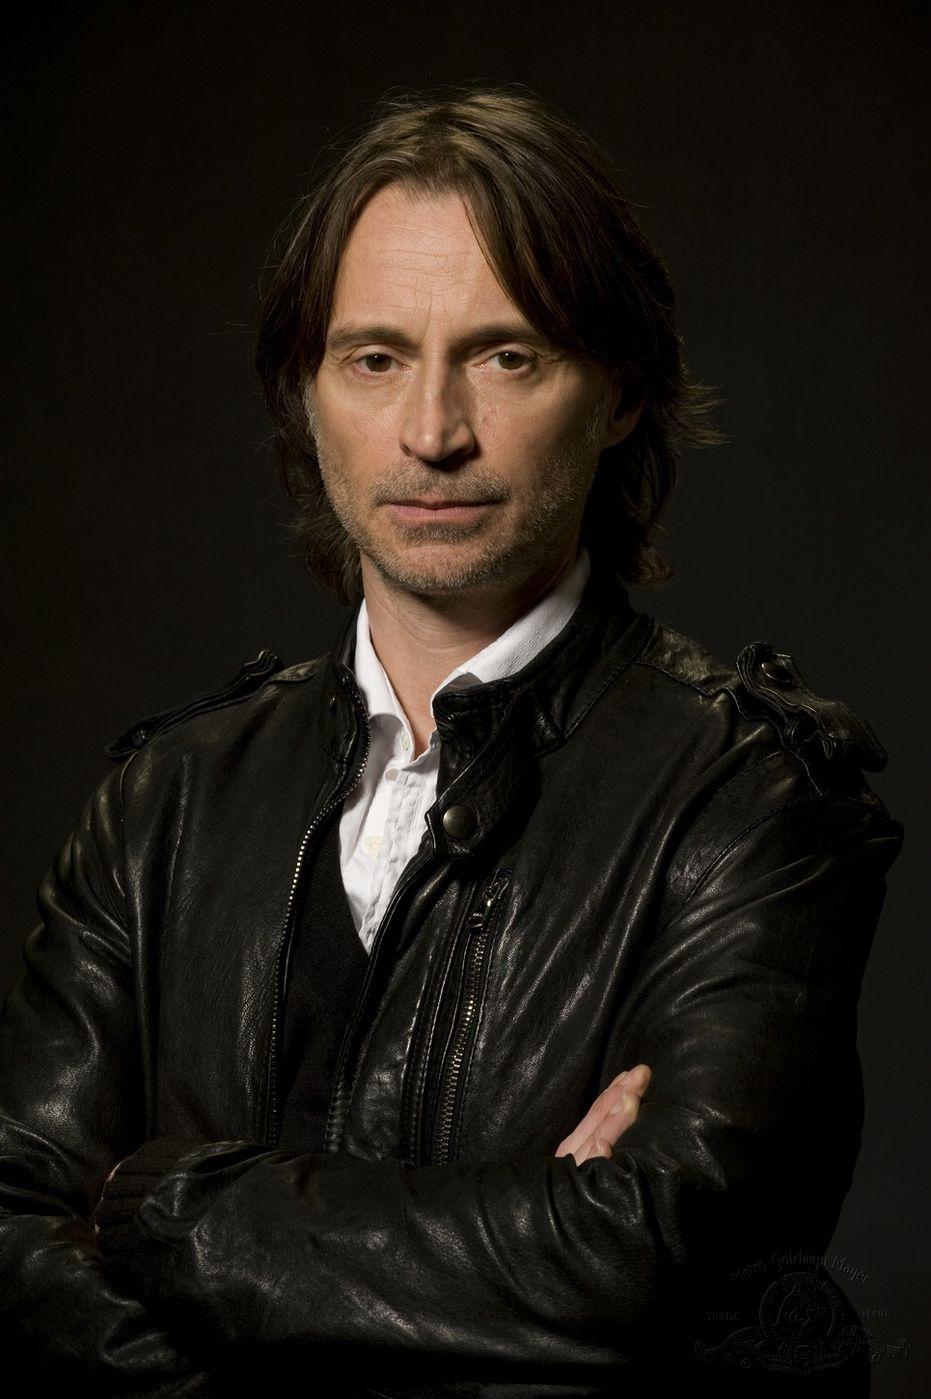 Robert Carlyle (born 1961)